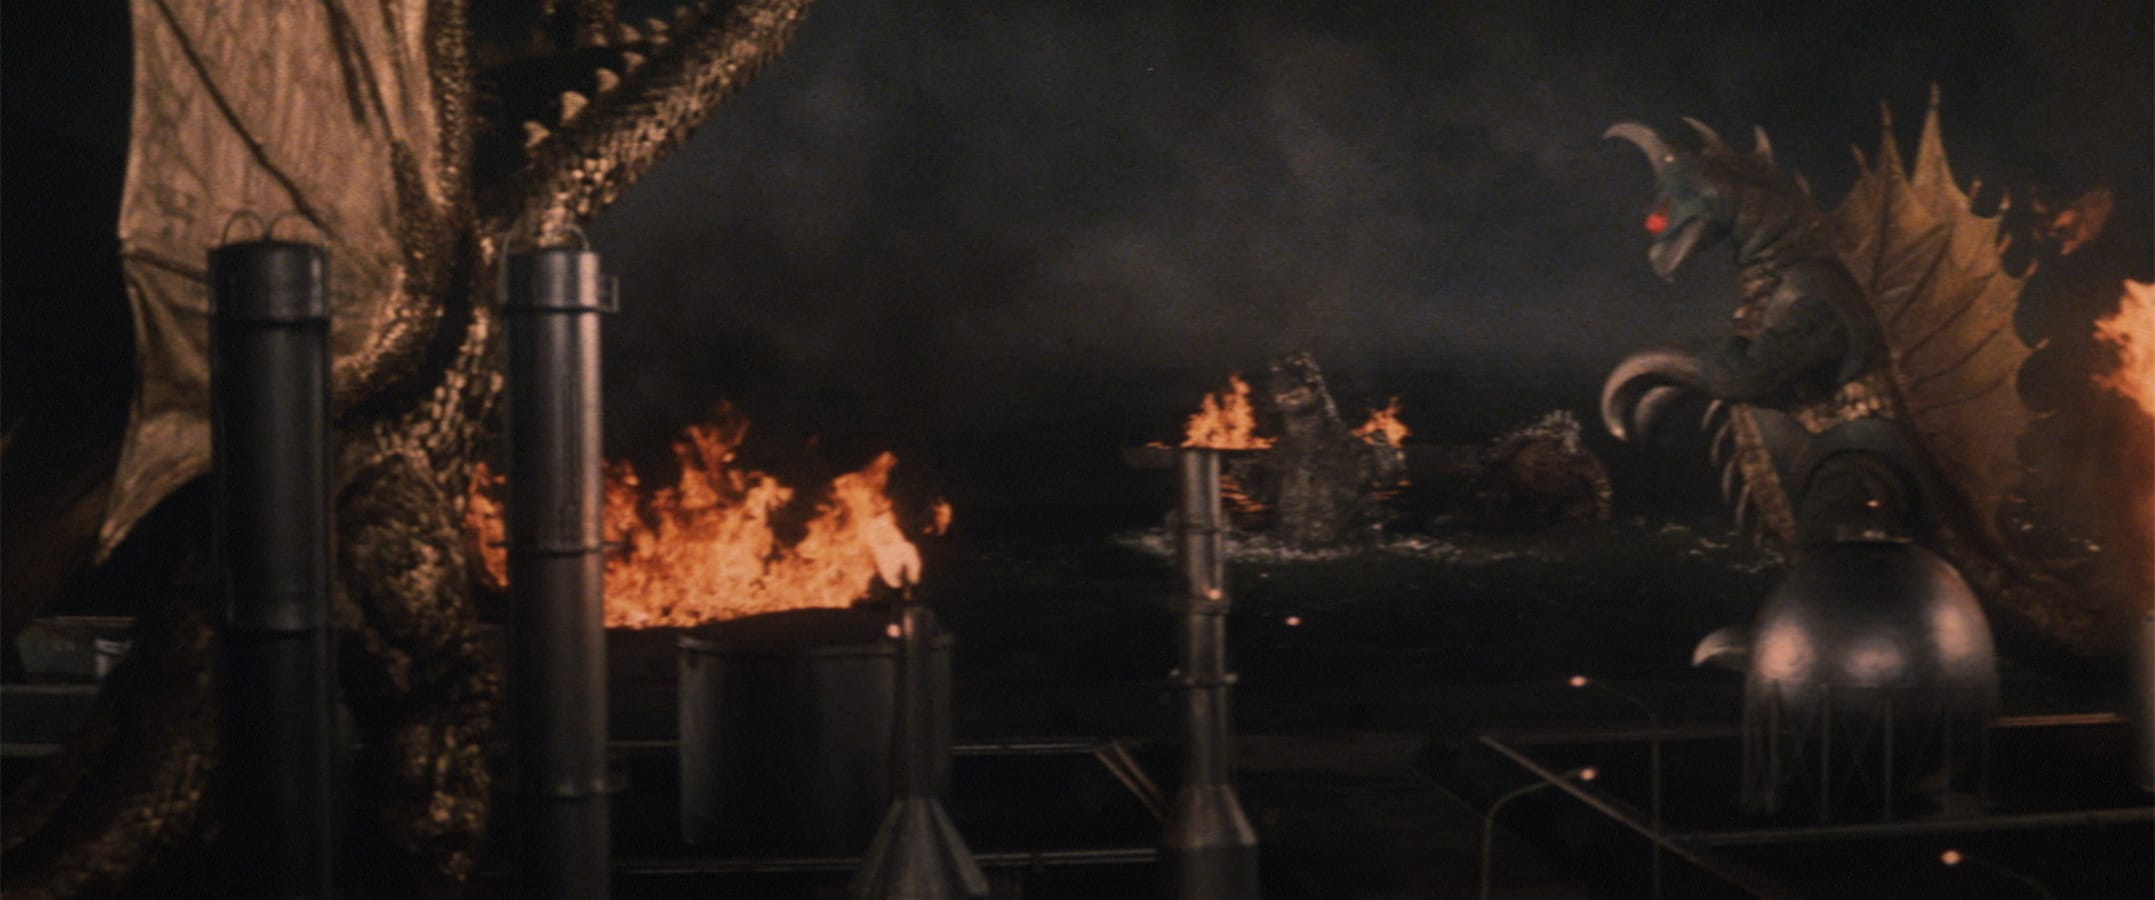 Godzilla vs. Gigan (1972) | The Criterion Collection